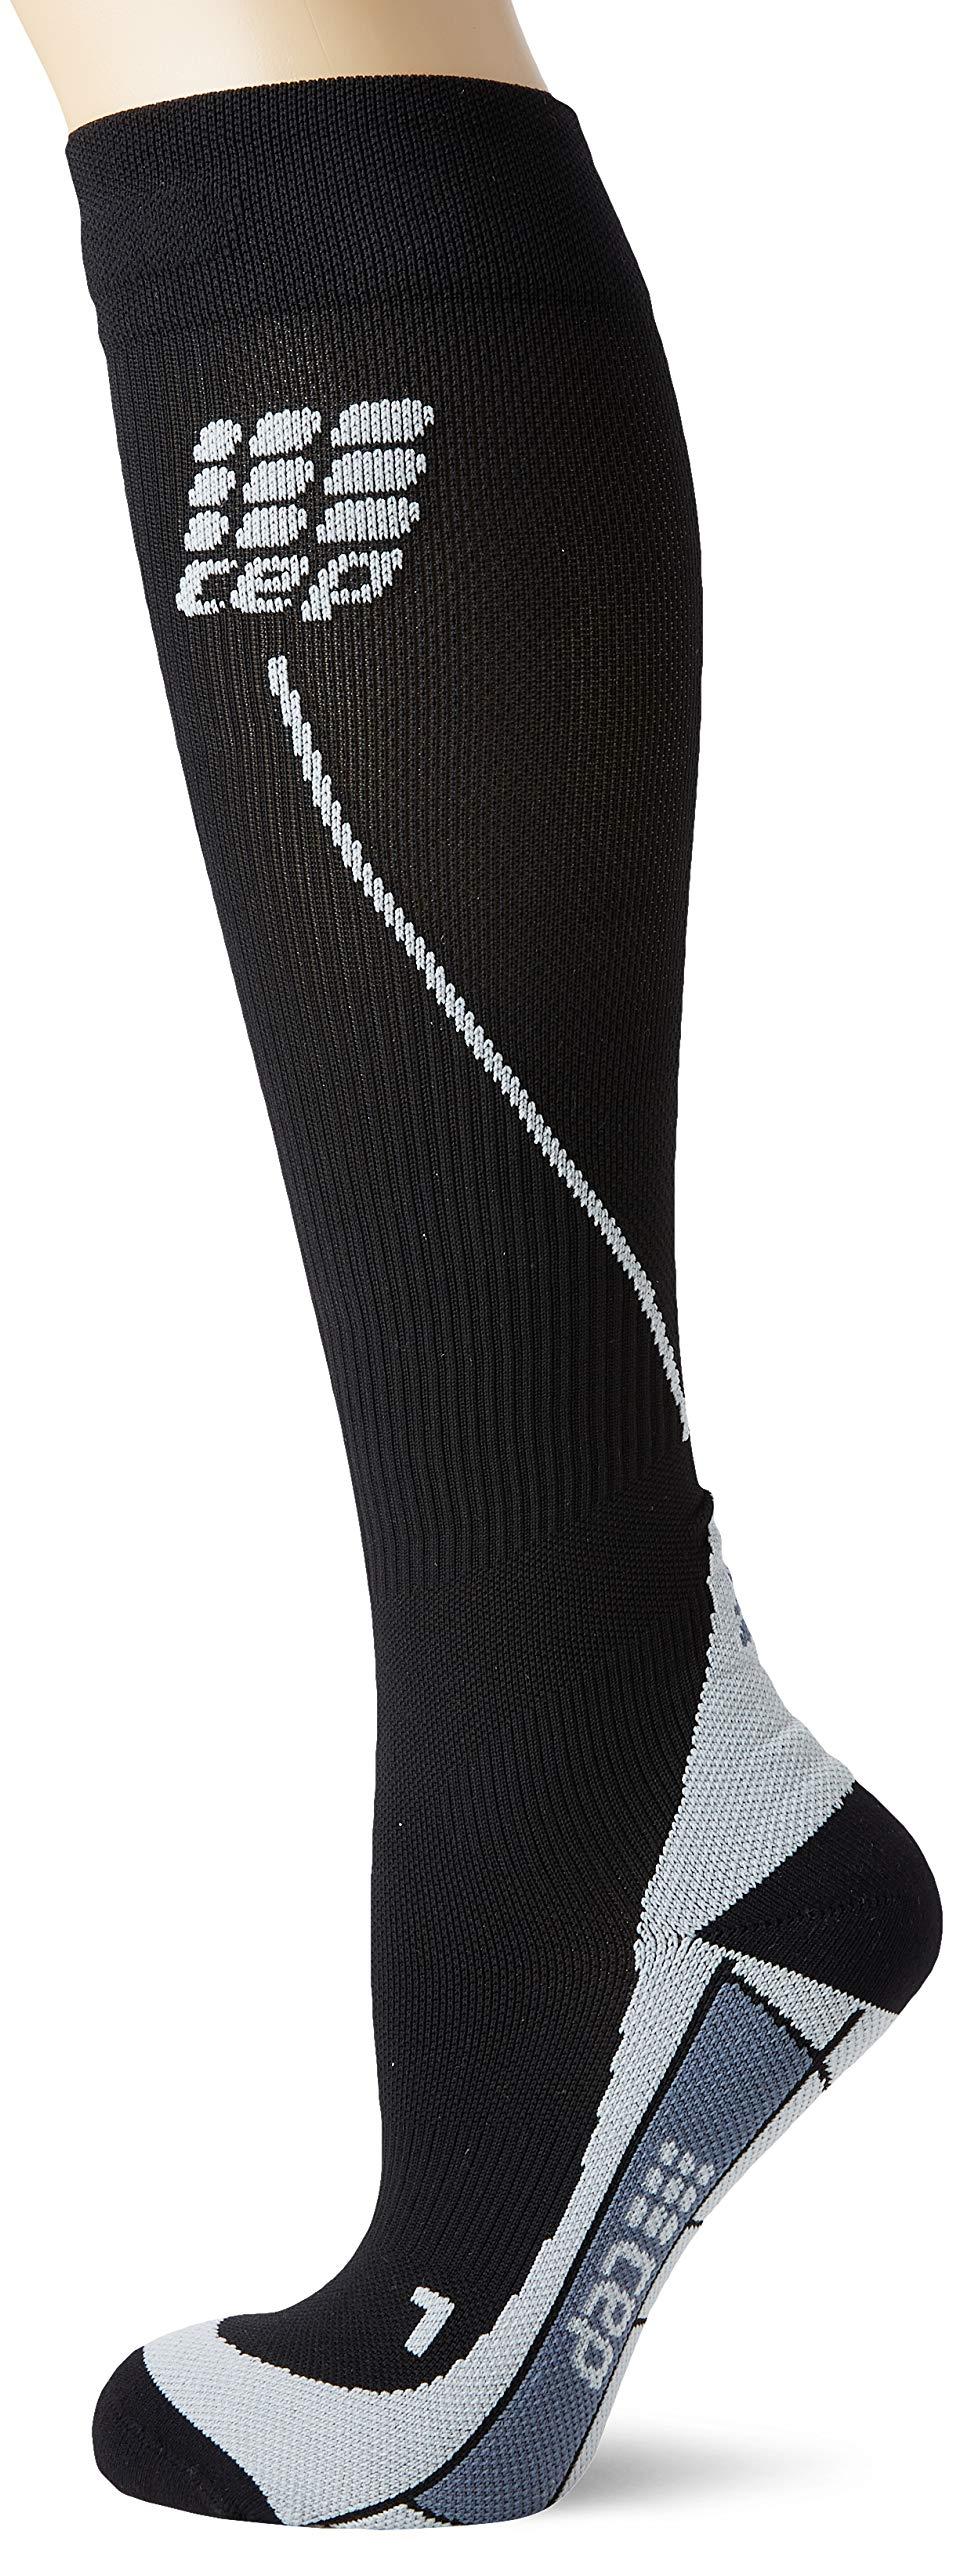 CEP Women's Progressive+ Run Socks 2.0, Black/Grey, 3 by CEP